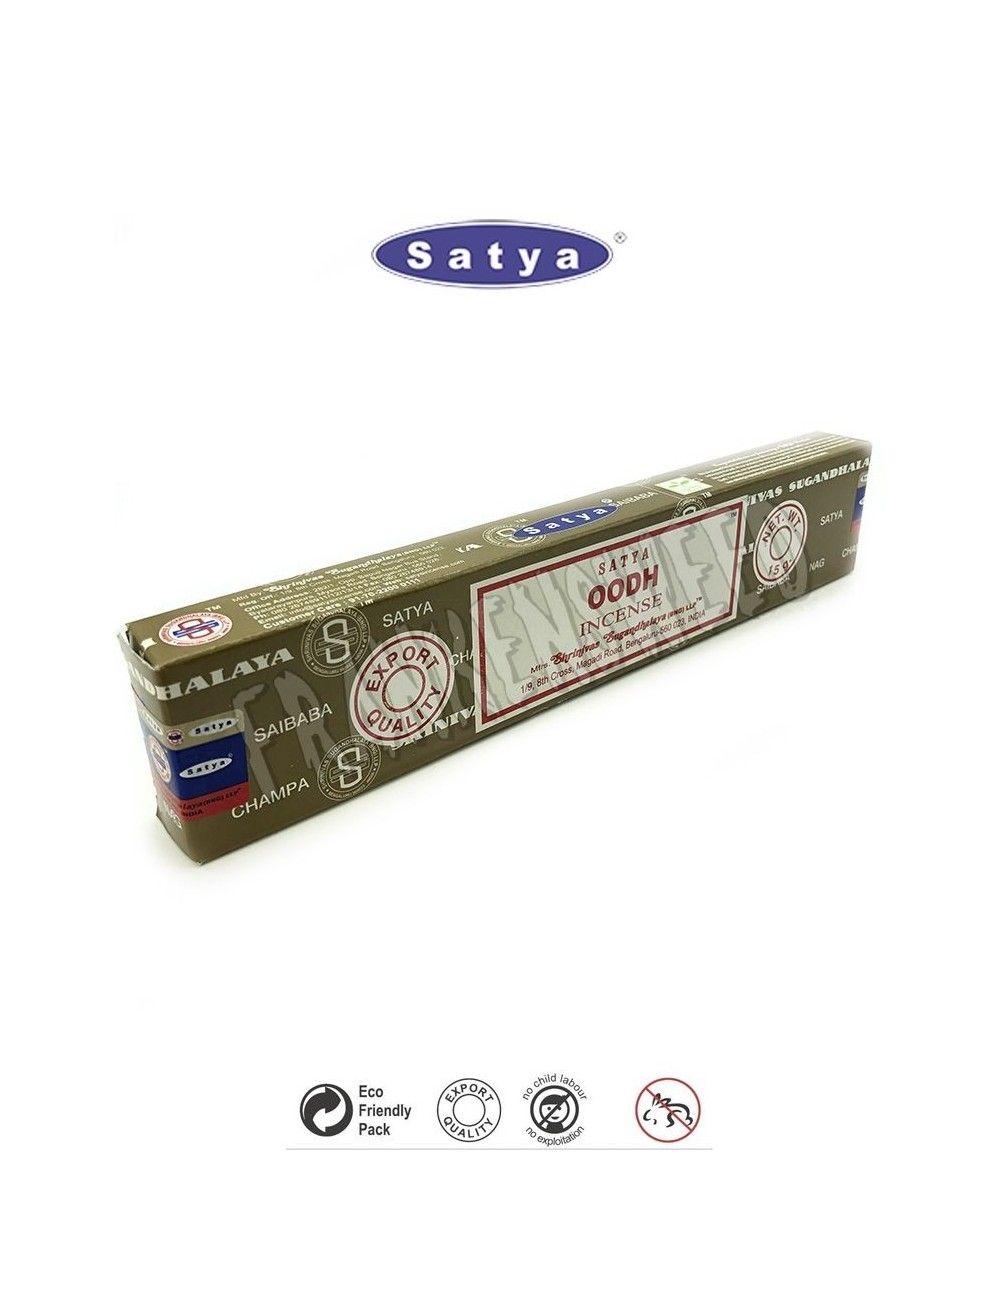 Oodh - Satya Sai Baba - Incense Sticks